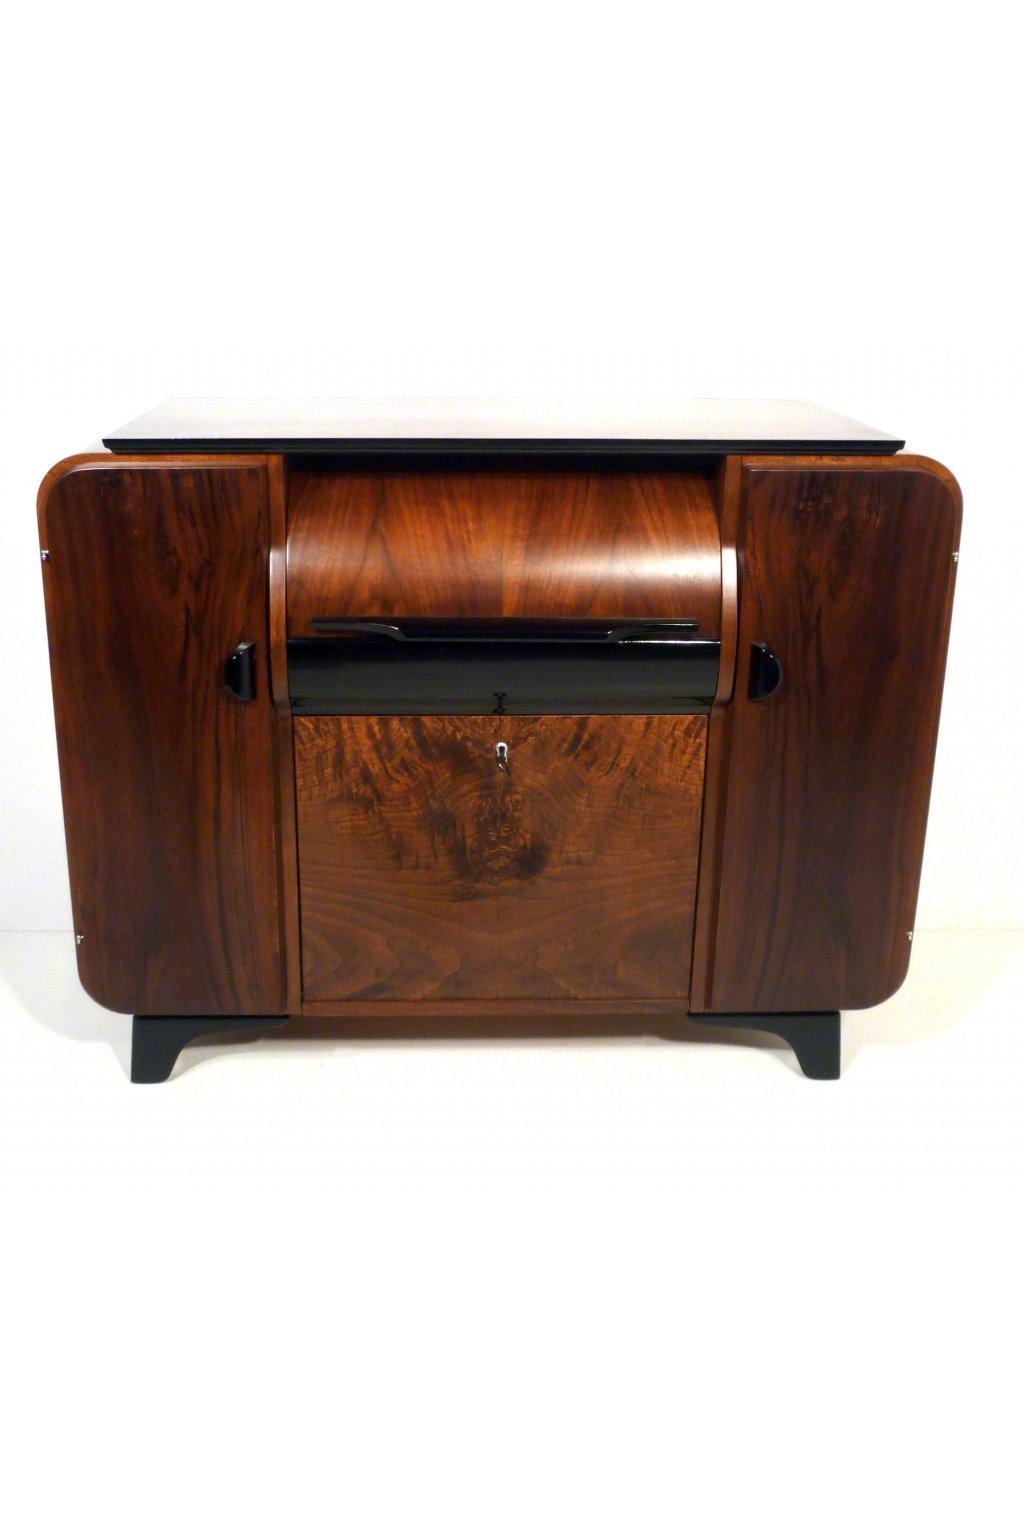 gramofonová skříňka halabala. nábytek halabala, furniture halabala